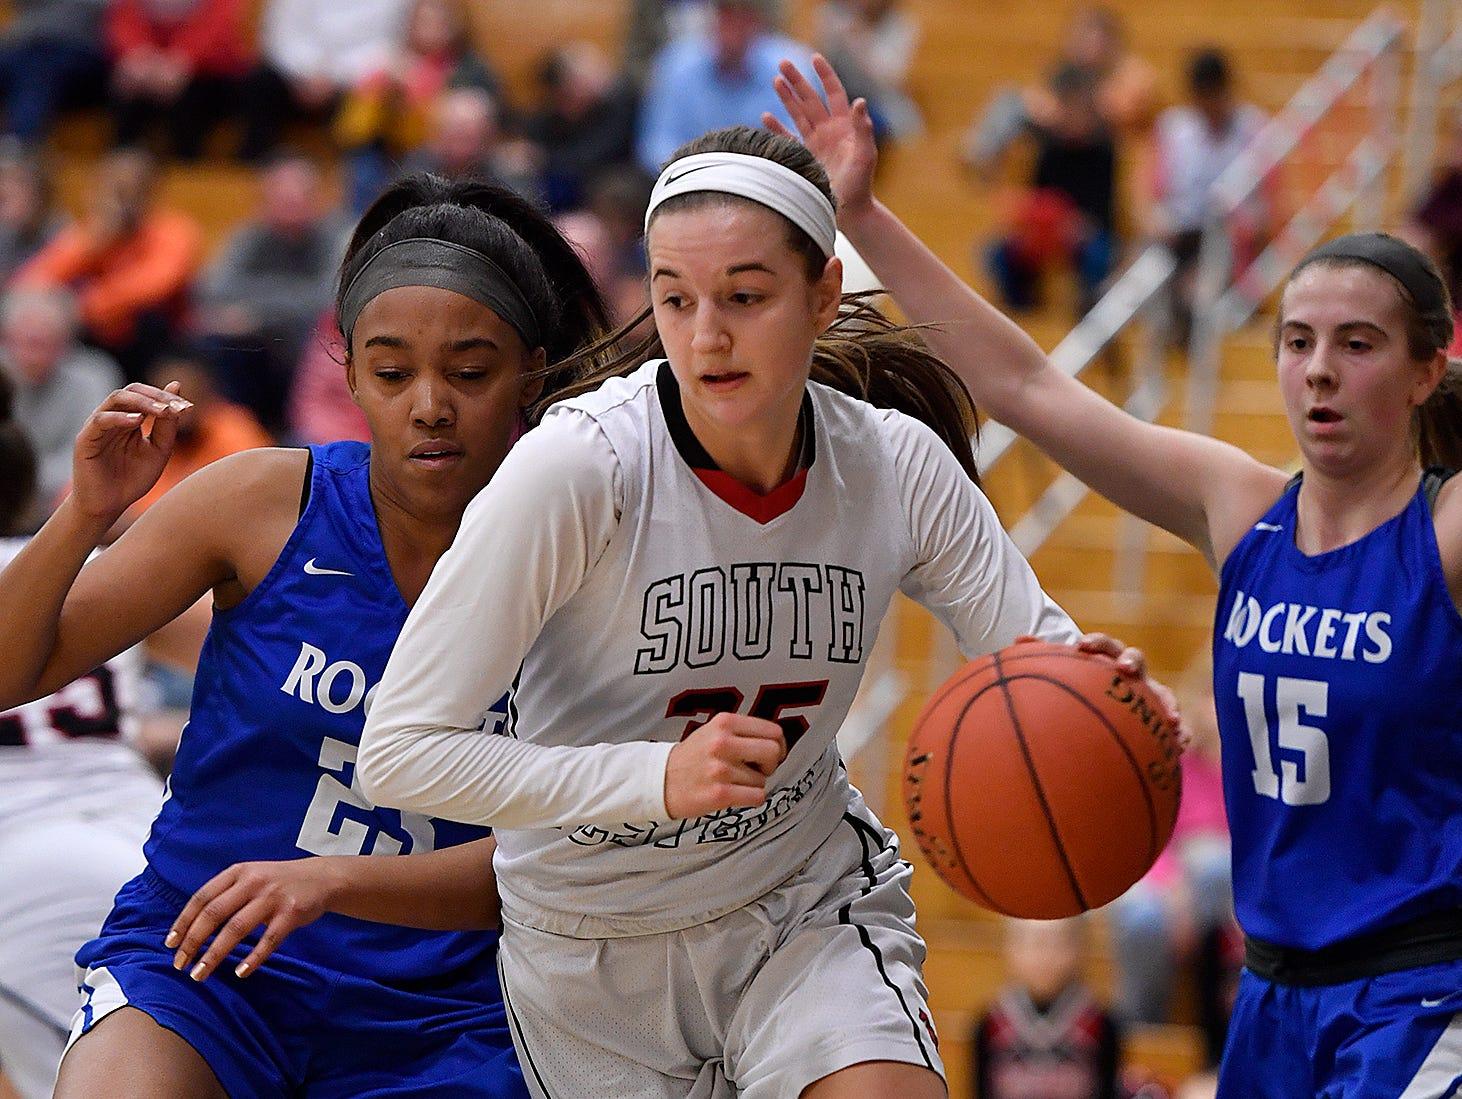 Spring Grove at South Western girls' basketball, Monday, Feb. 4, 2019.John A. Pavoncello photo